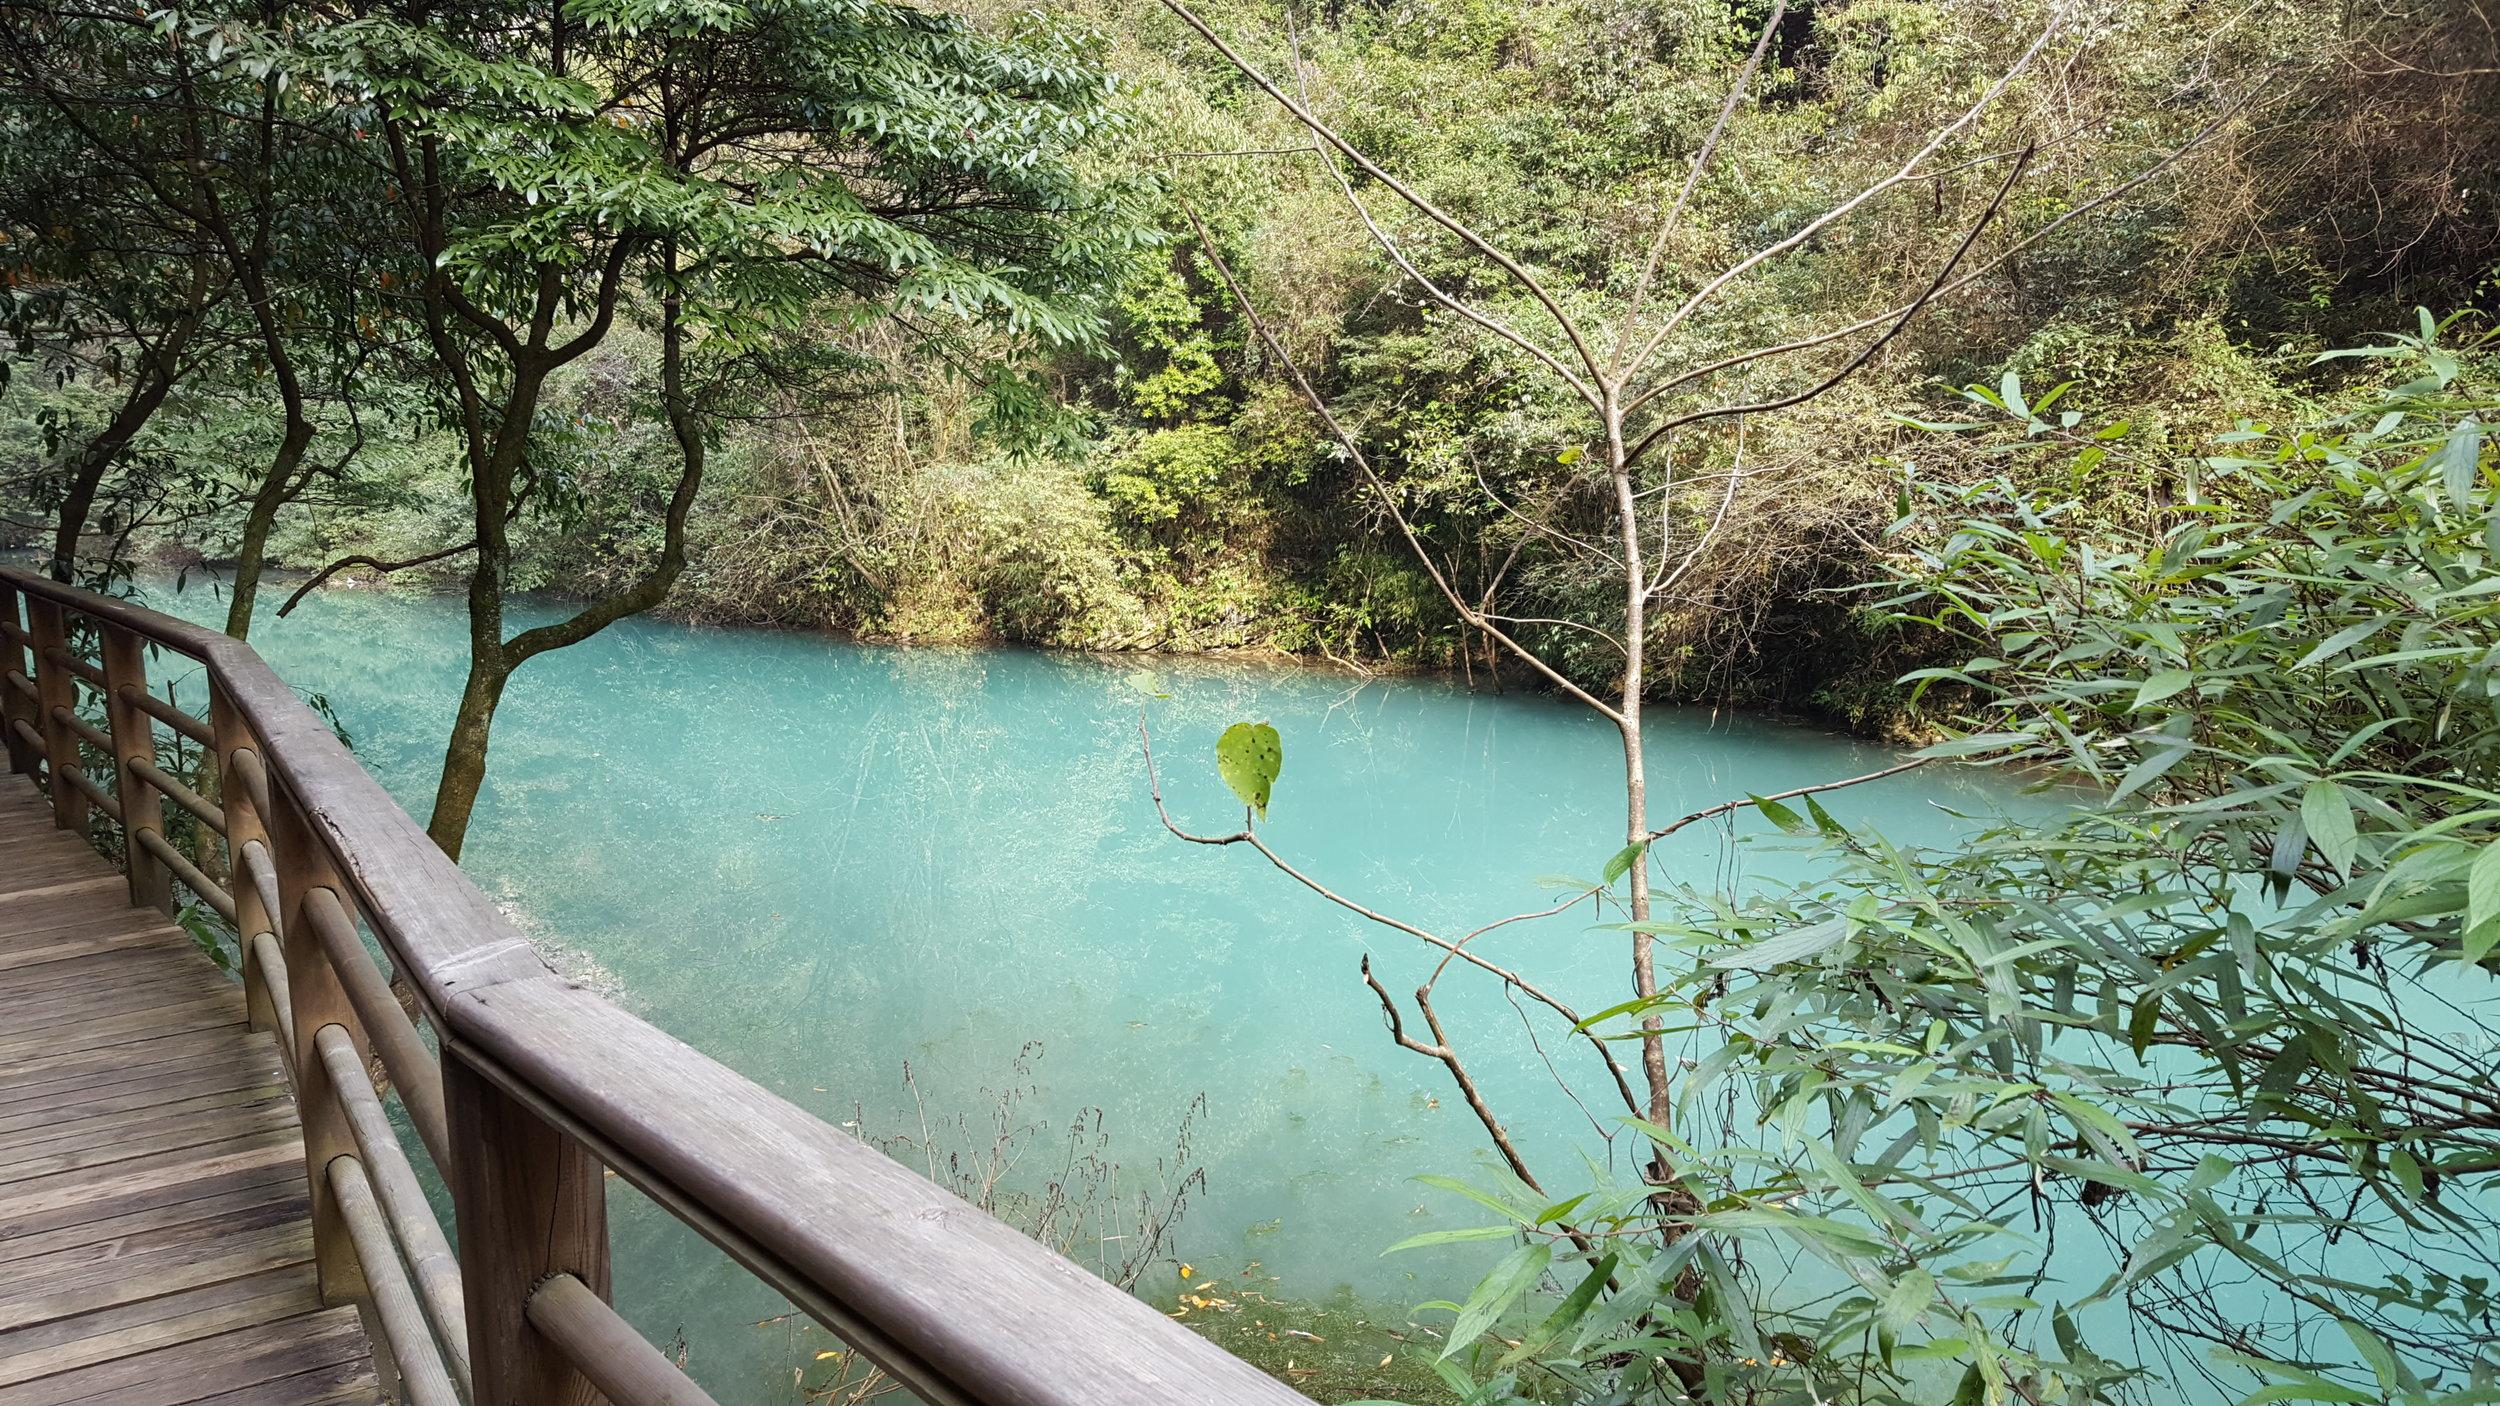 Turquoise water at the bottom of Zhangjiajie Grand Canyon